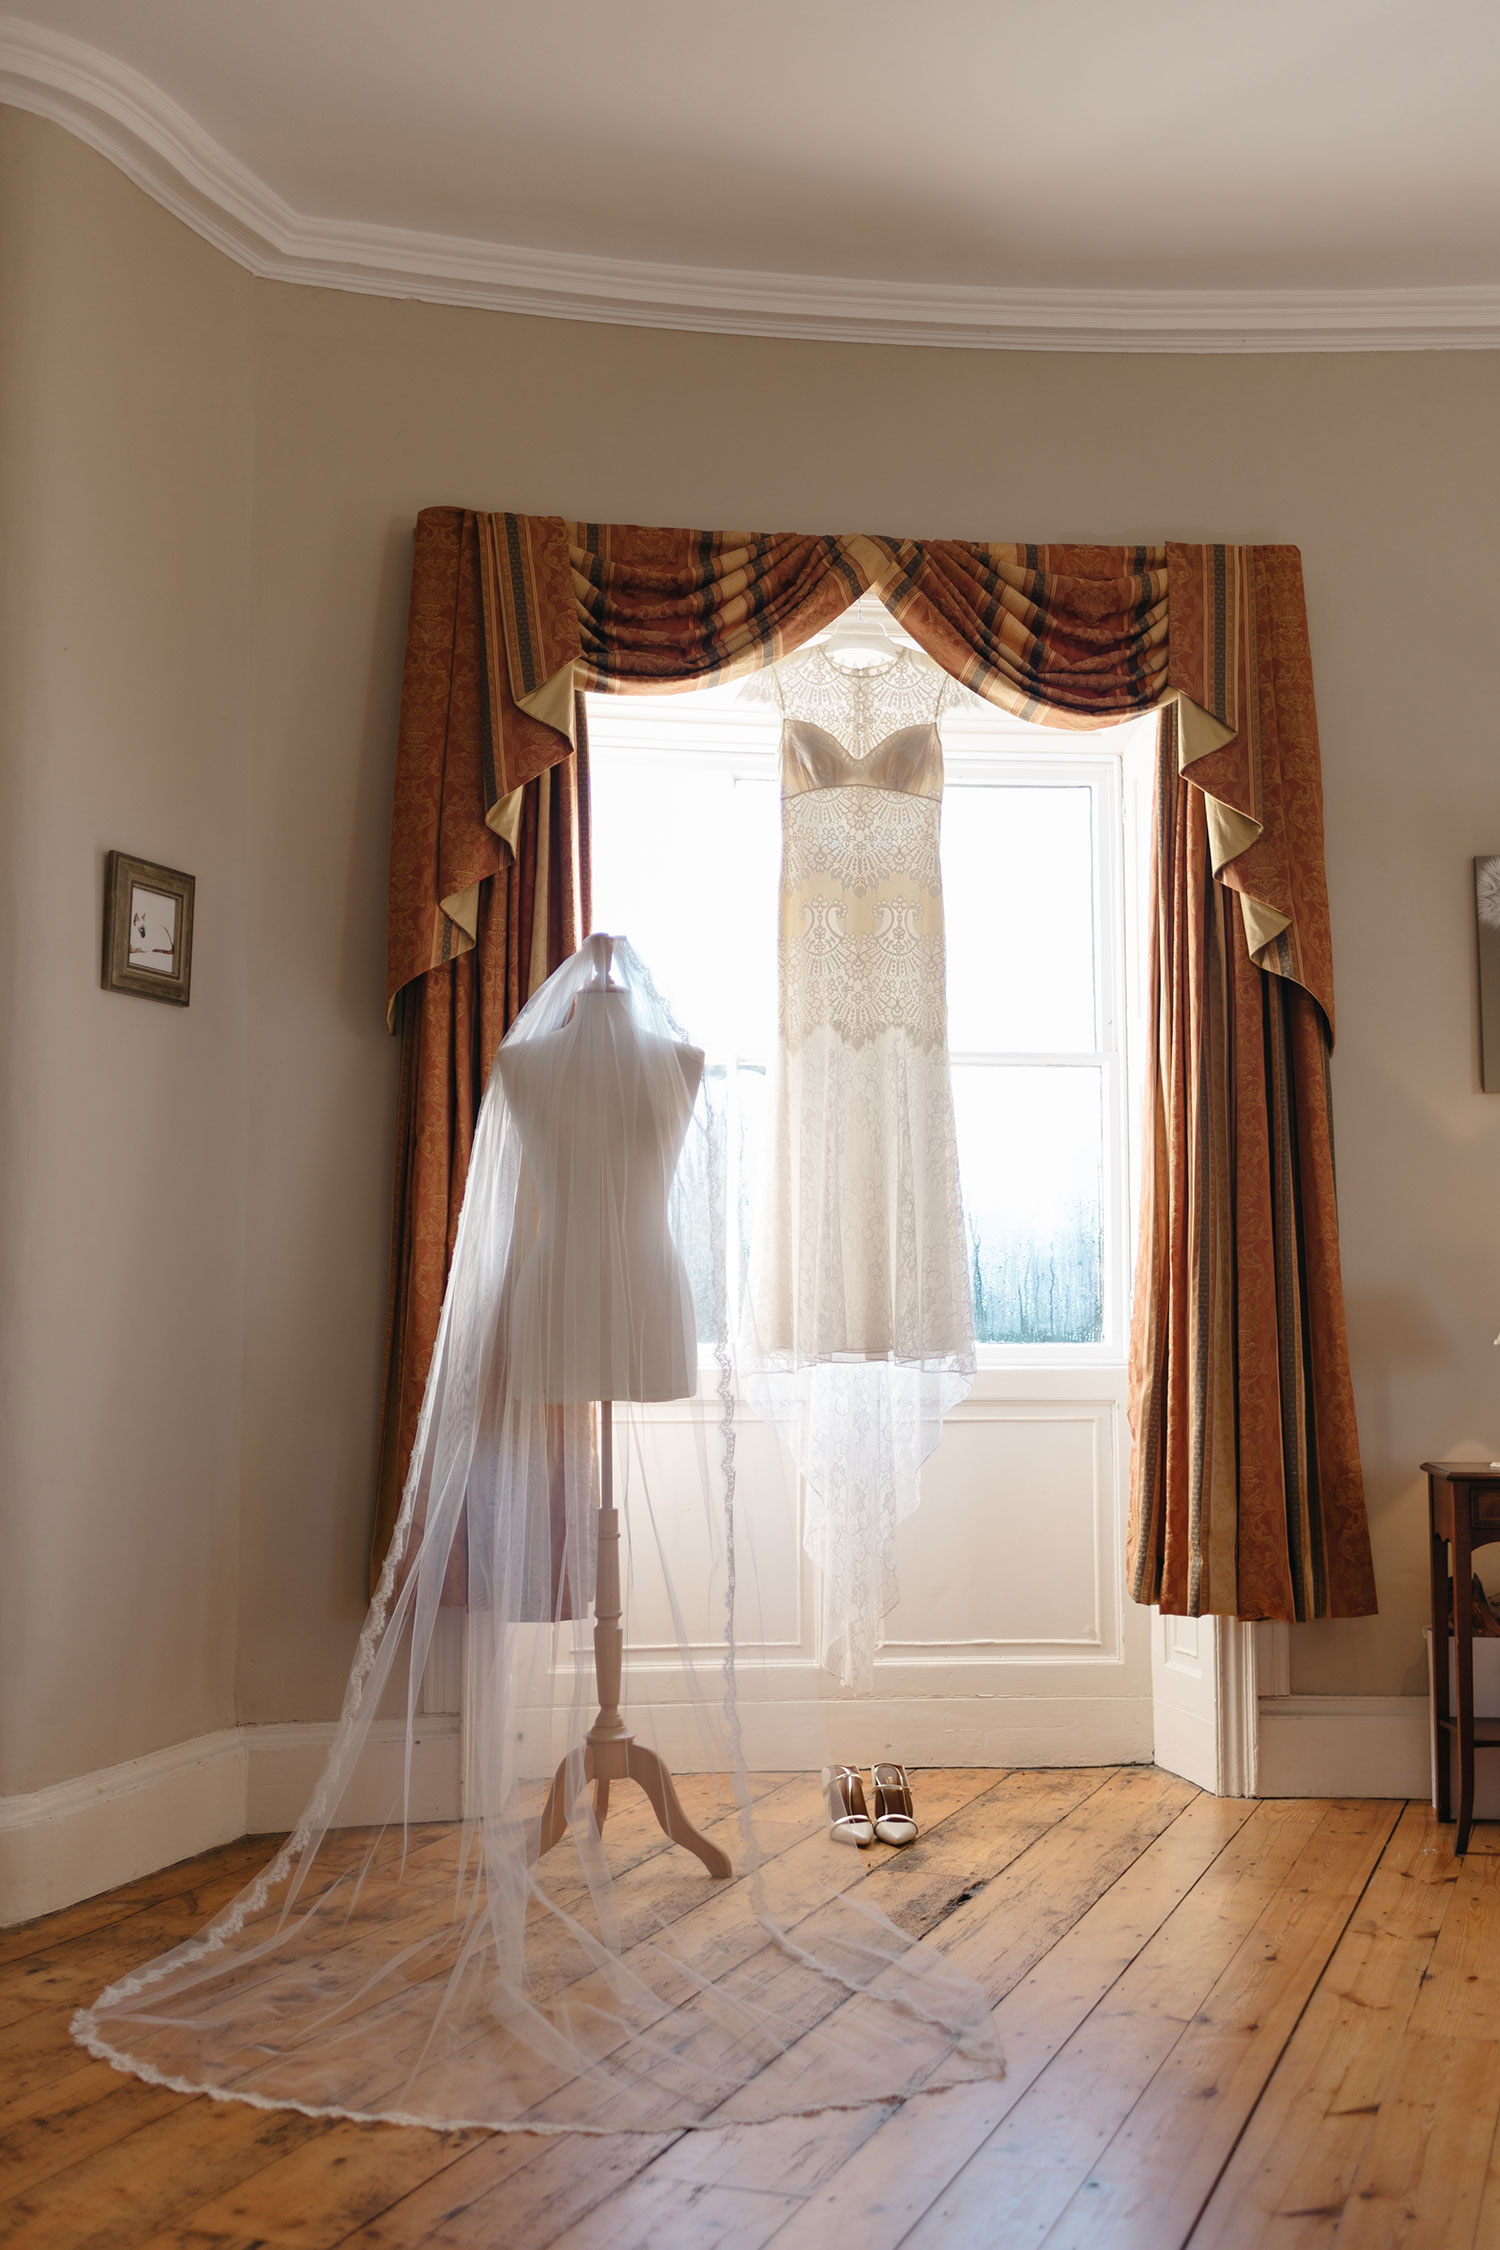 bellinter-house-wedding-photographer-0006_0006.jpg